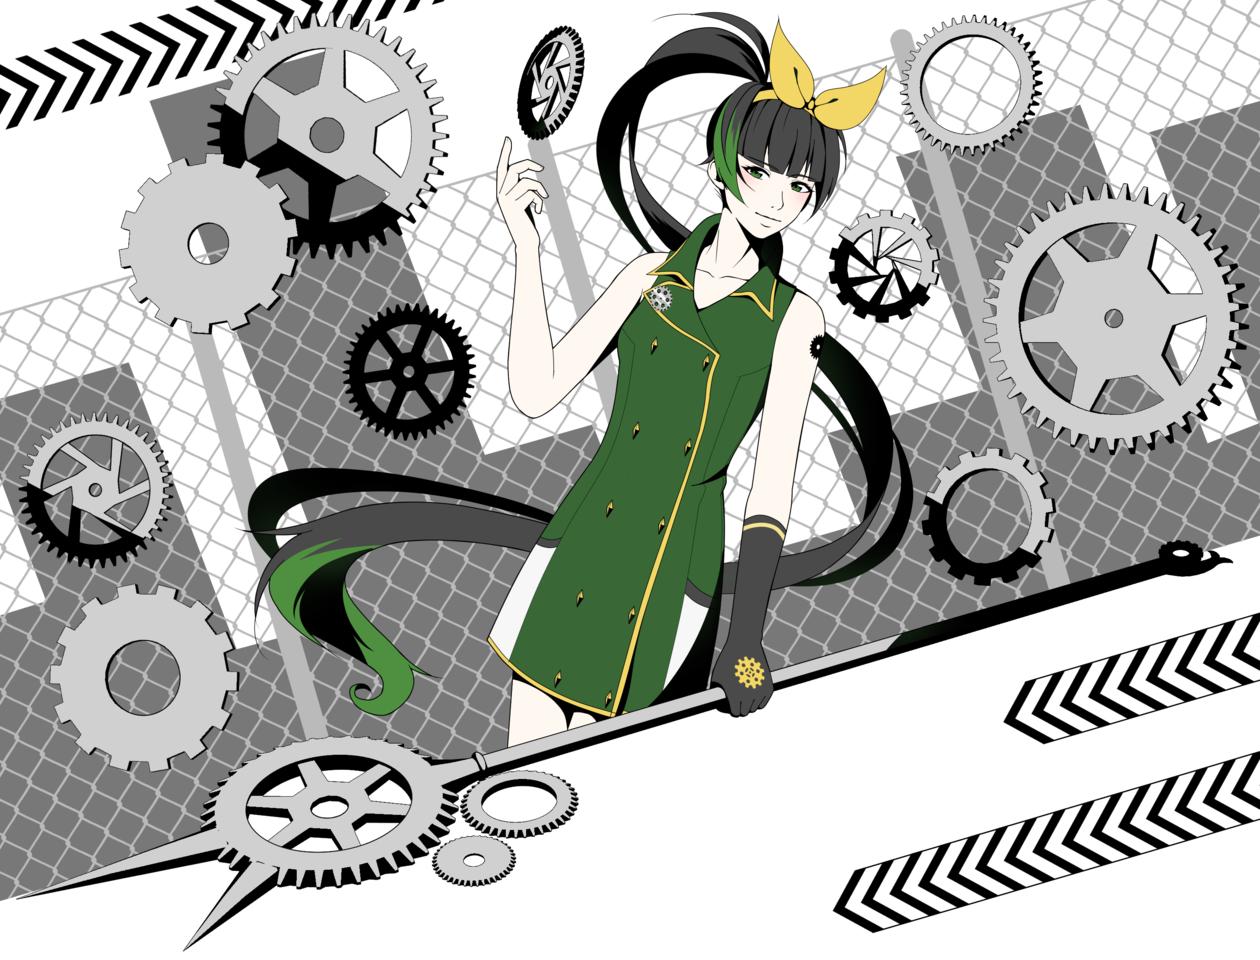 Ivy Illust of Bee 48 greeneyes gears girl weapon oc manga original blackhair gear digital